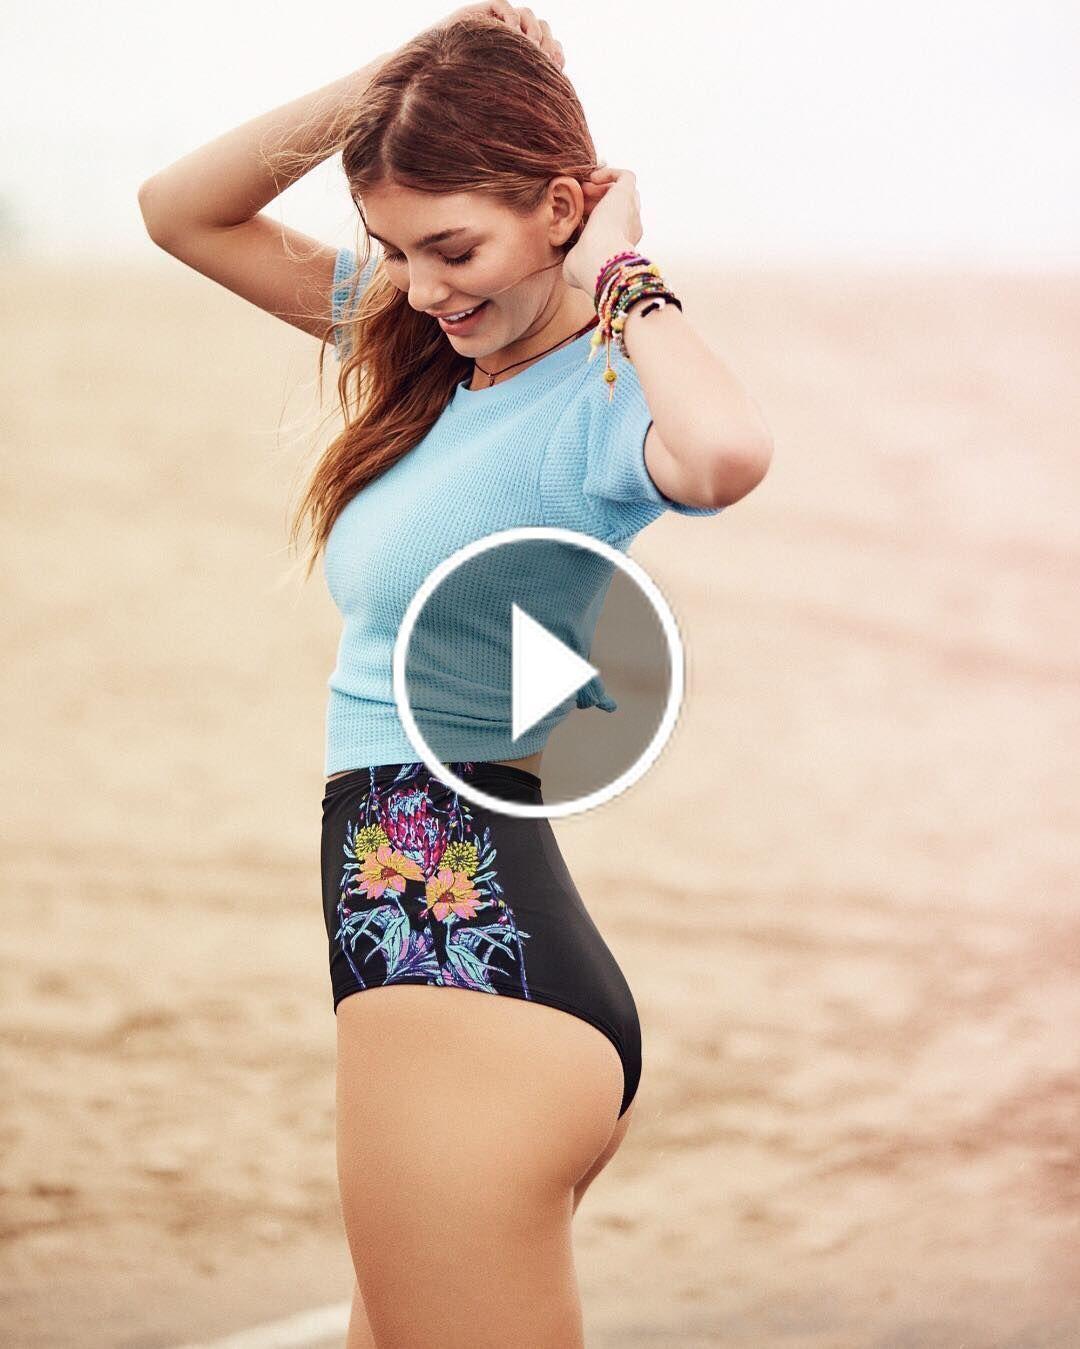 9dfa70a84 Sexy Bikinis Women Swimsuit 2019 Push Up Swimwear Slim Floral Bikini Set  Halter Top Bathing Suit Summer Beach Wear XXL Price  27.98   FREE Shipping    ...